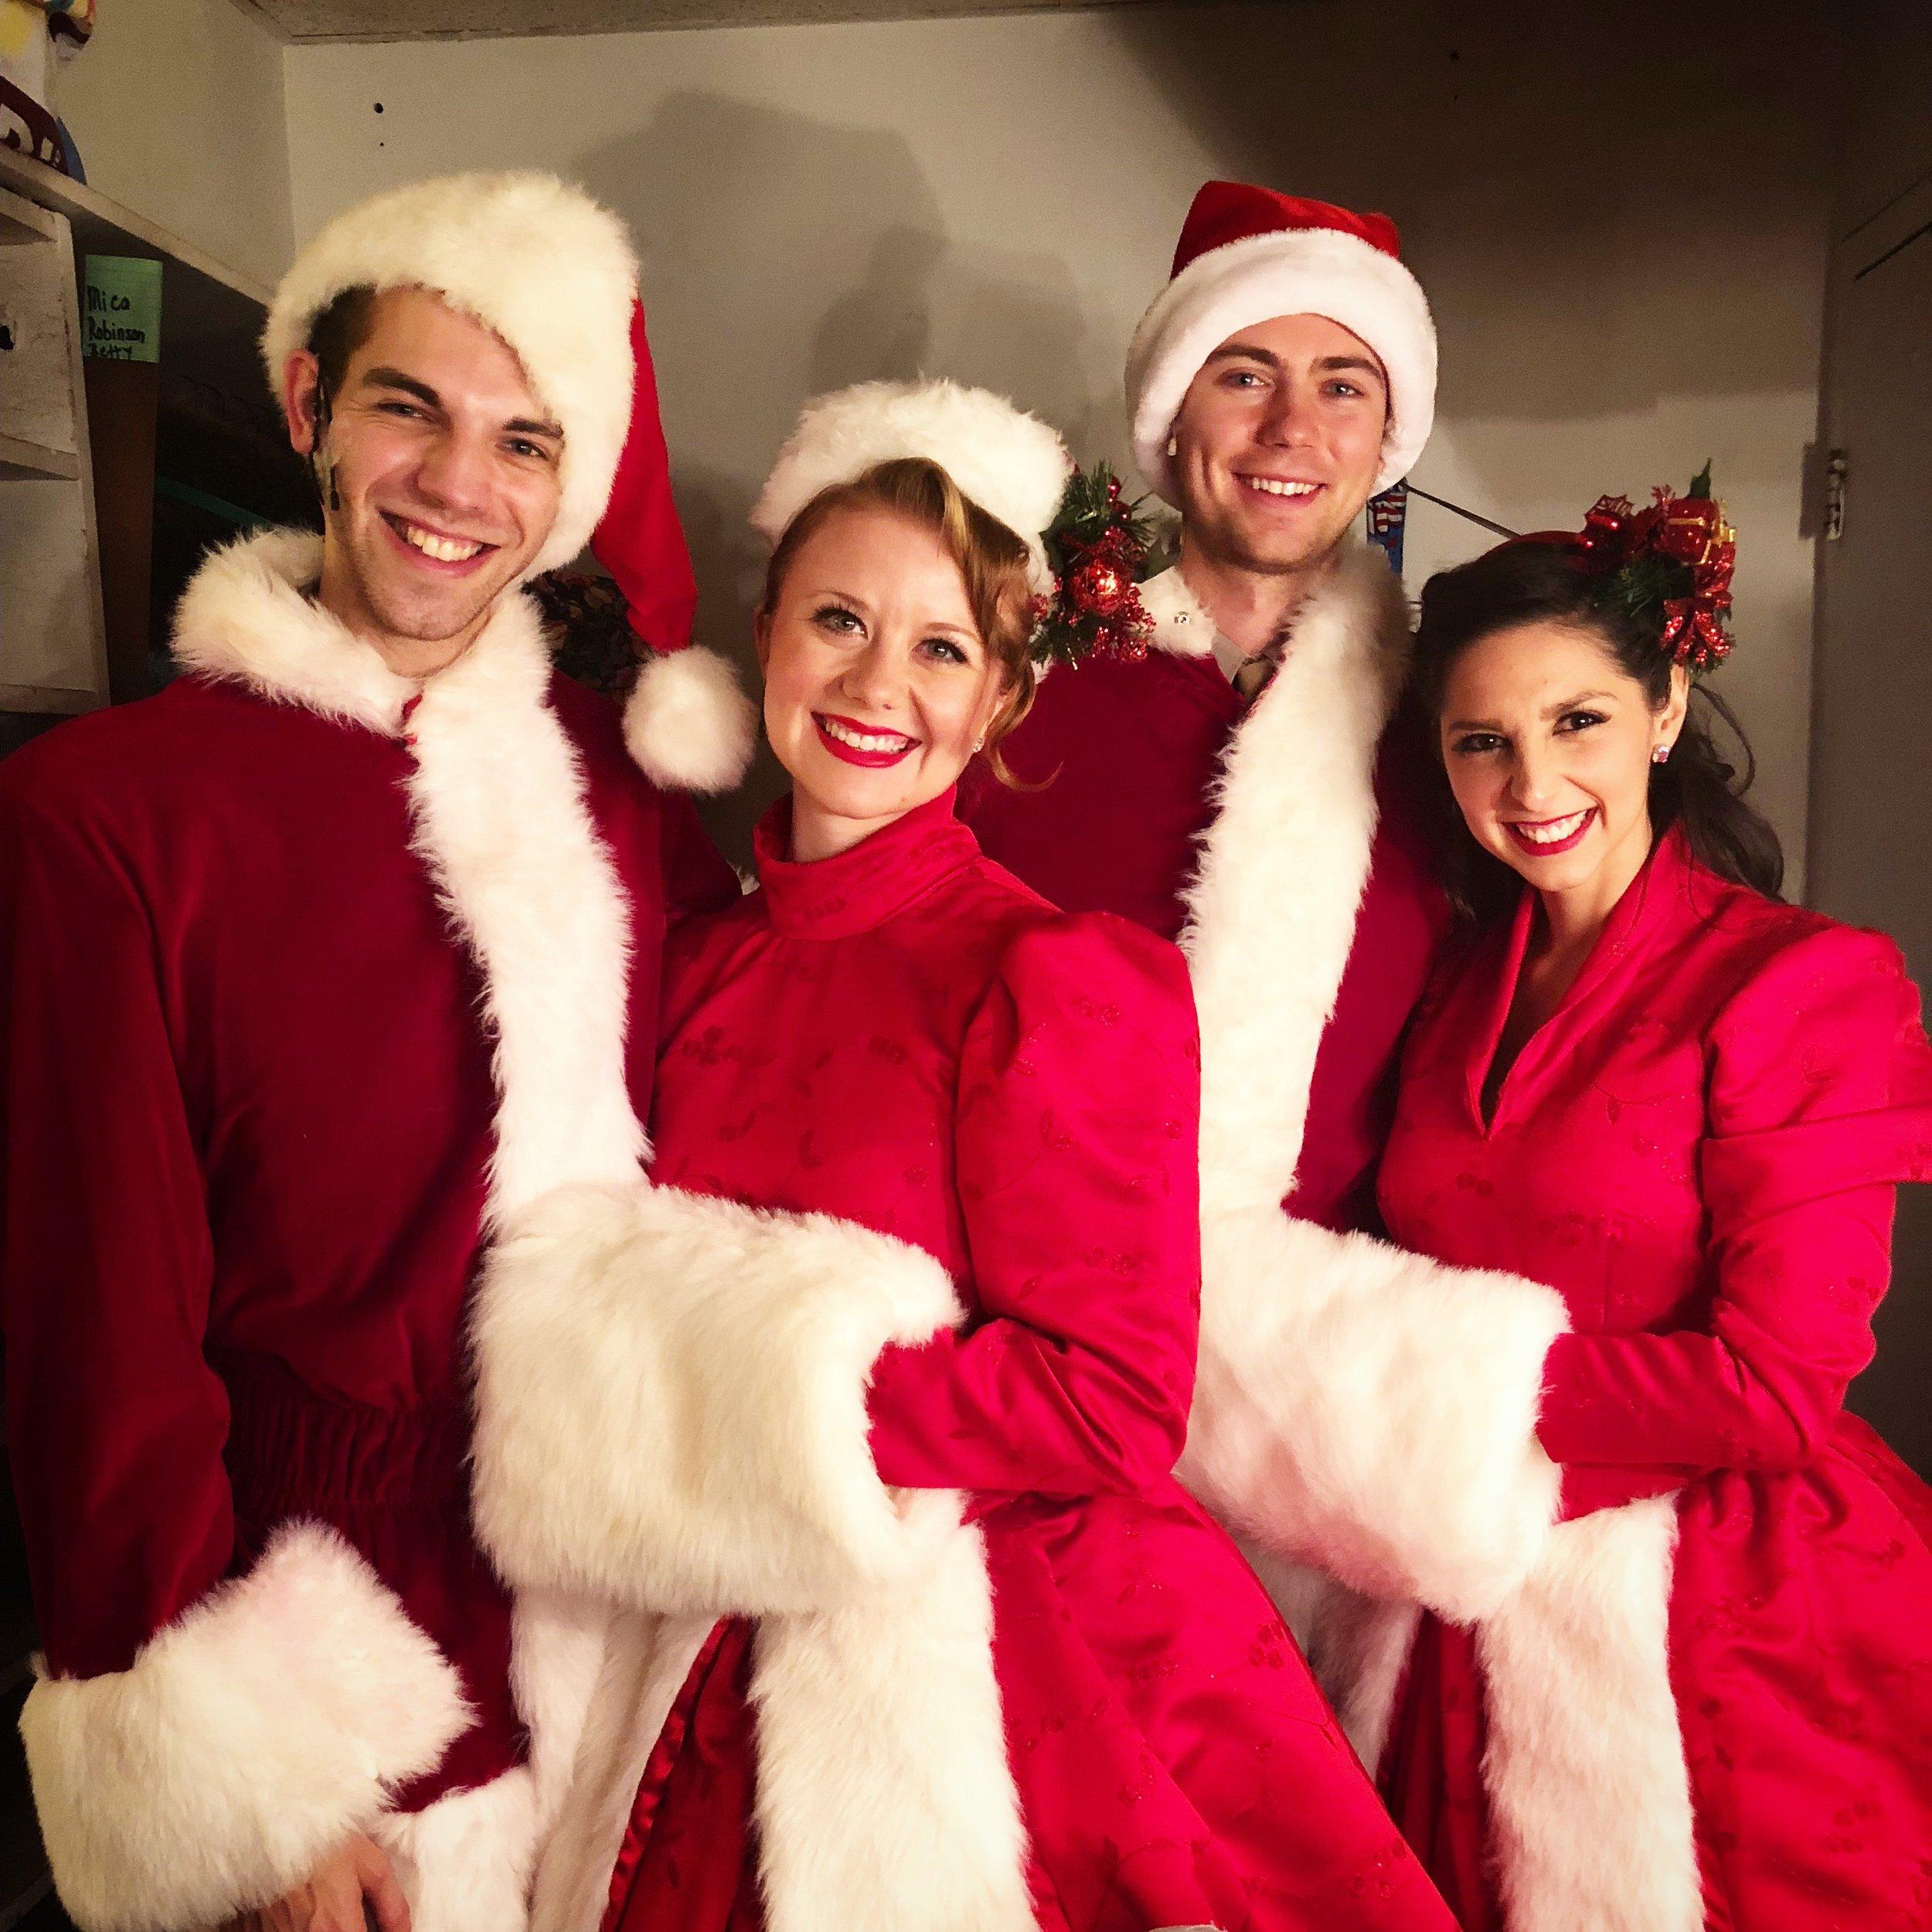 Judy Haynes in    White Christmas        La Comedia Dinner Theatre Springboro, OH November 1 - December 31, 2018